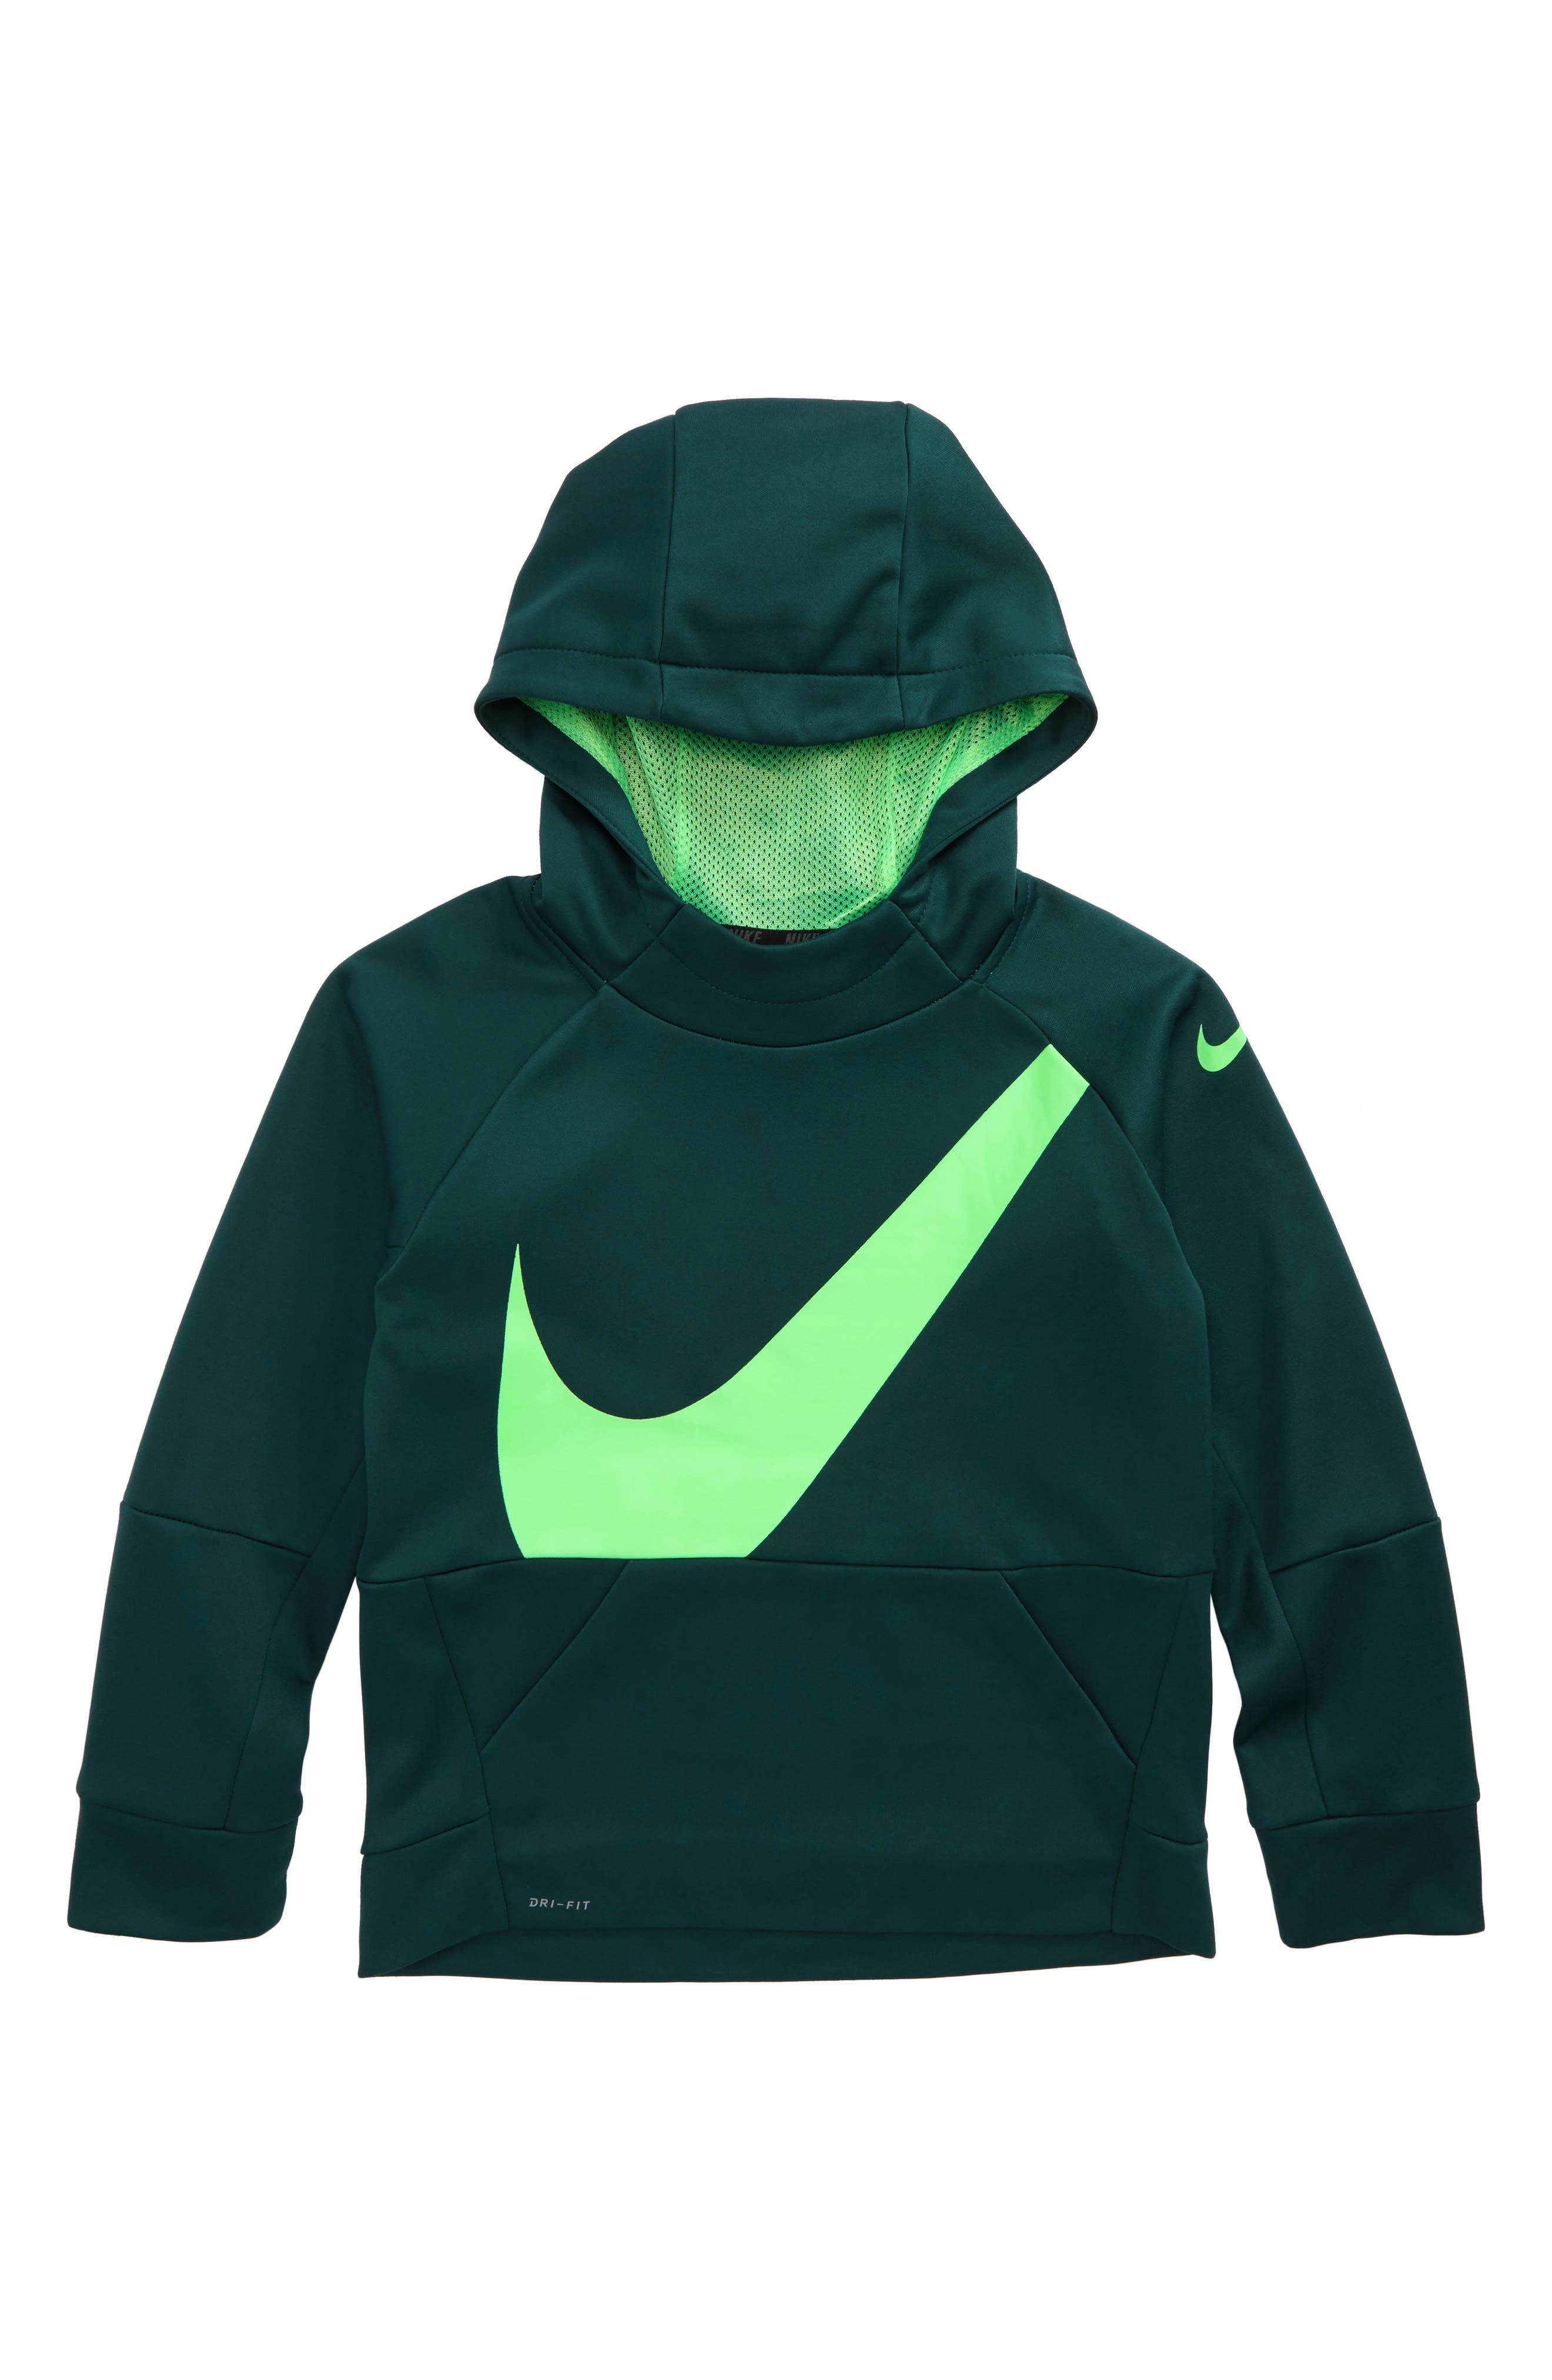 Main Image - Nike Therma Dry Swoosh Hoodie (Toddler Boys & Little Boys)